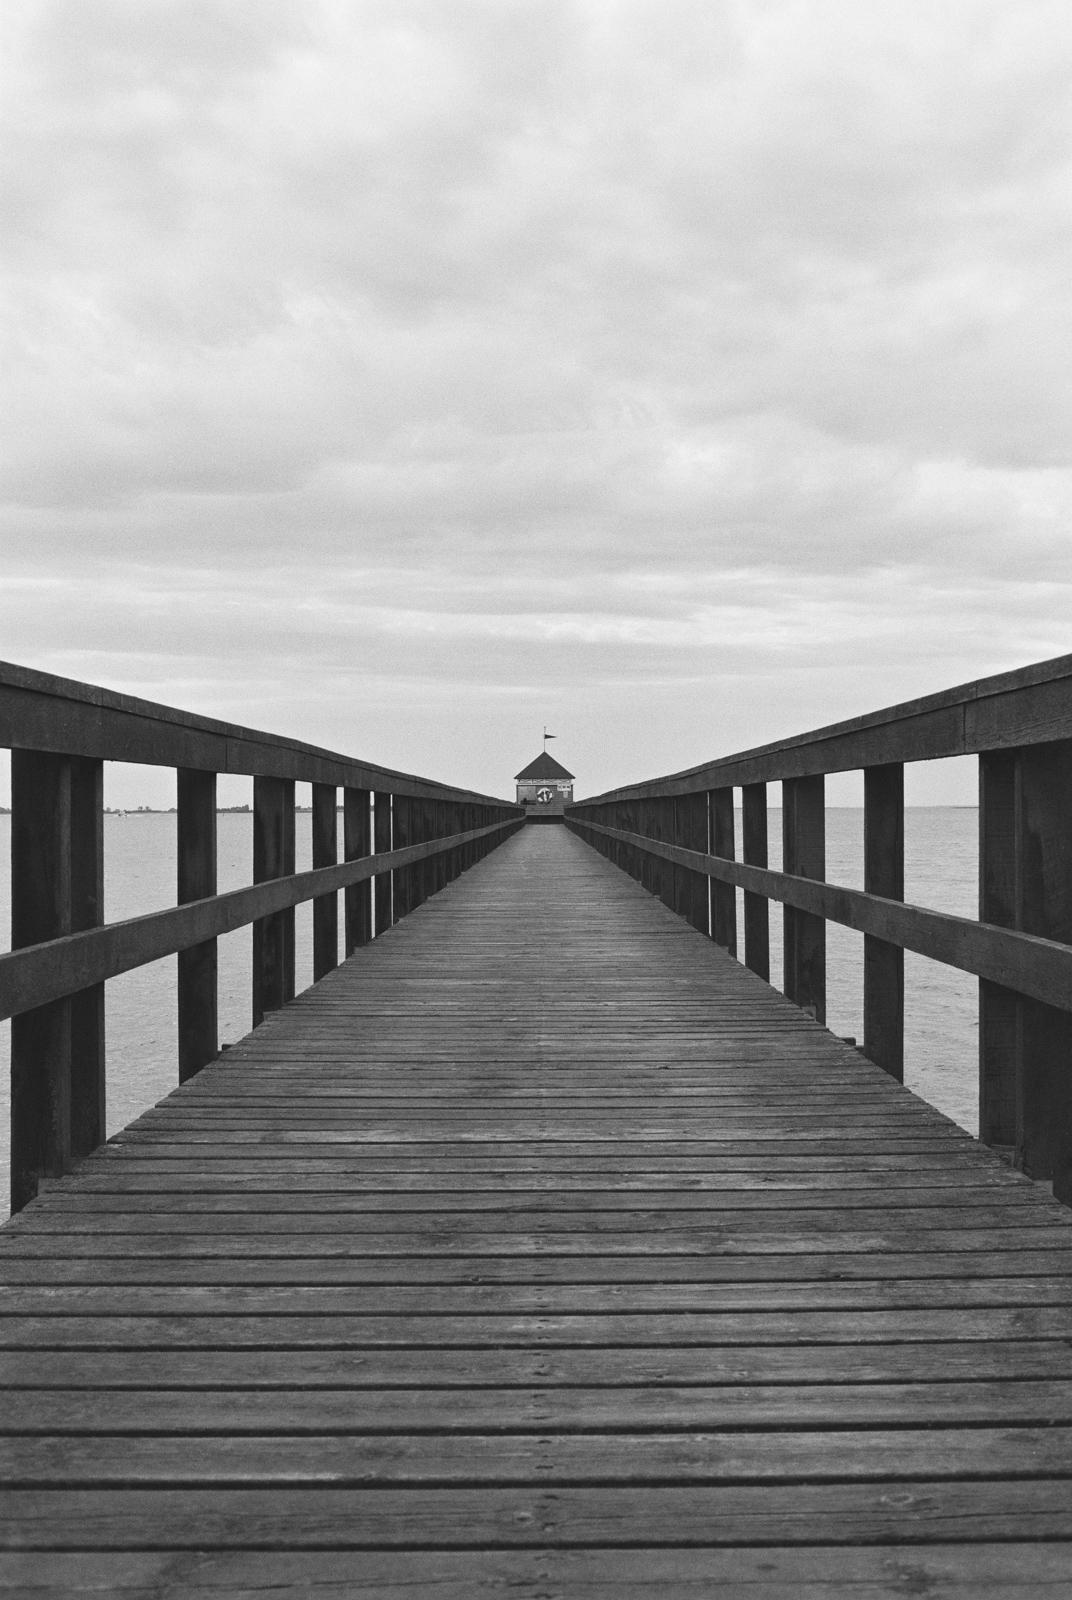 PhotoExif - Camera: Leica R7, Film: Kentmere , Comment: